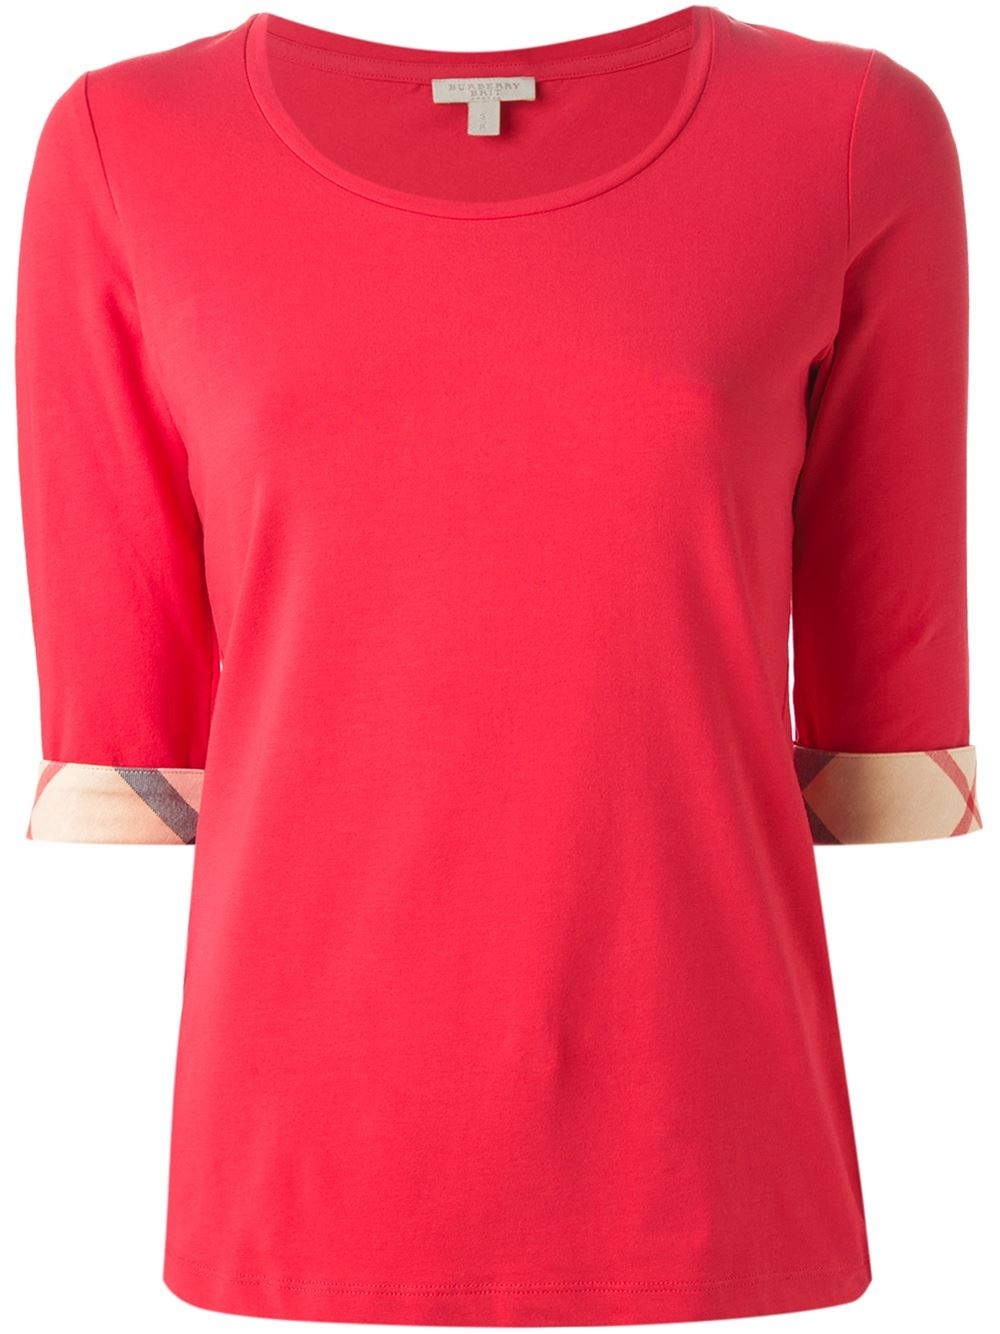 Lyst Burberry Brit Three Quarter Length T Shirt In Pink